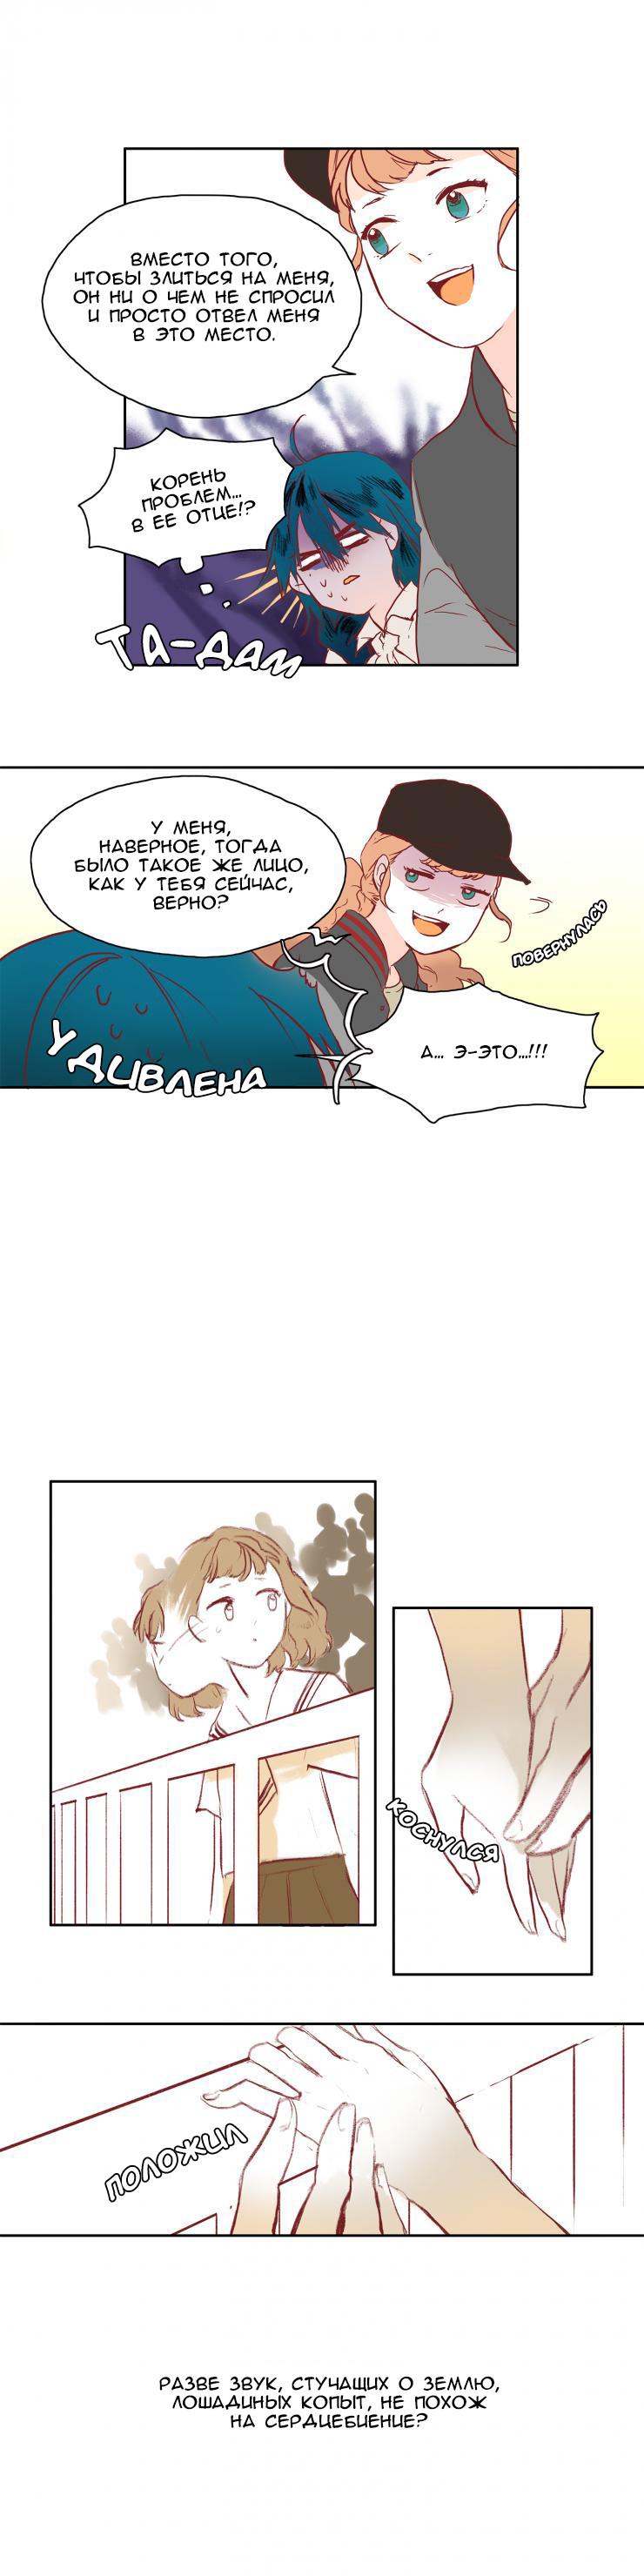 https://r1.ninemanga.com/comics/pic2/30/31902/435034/1536807420886.jpg Page 6